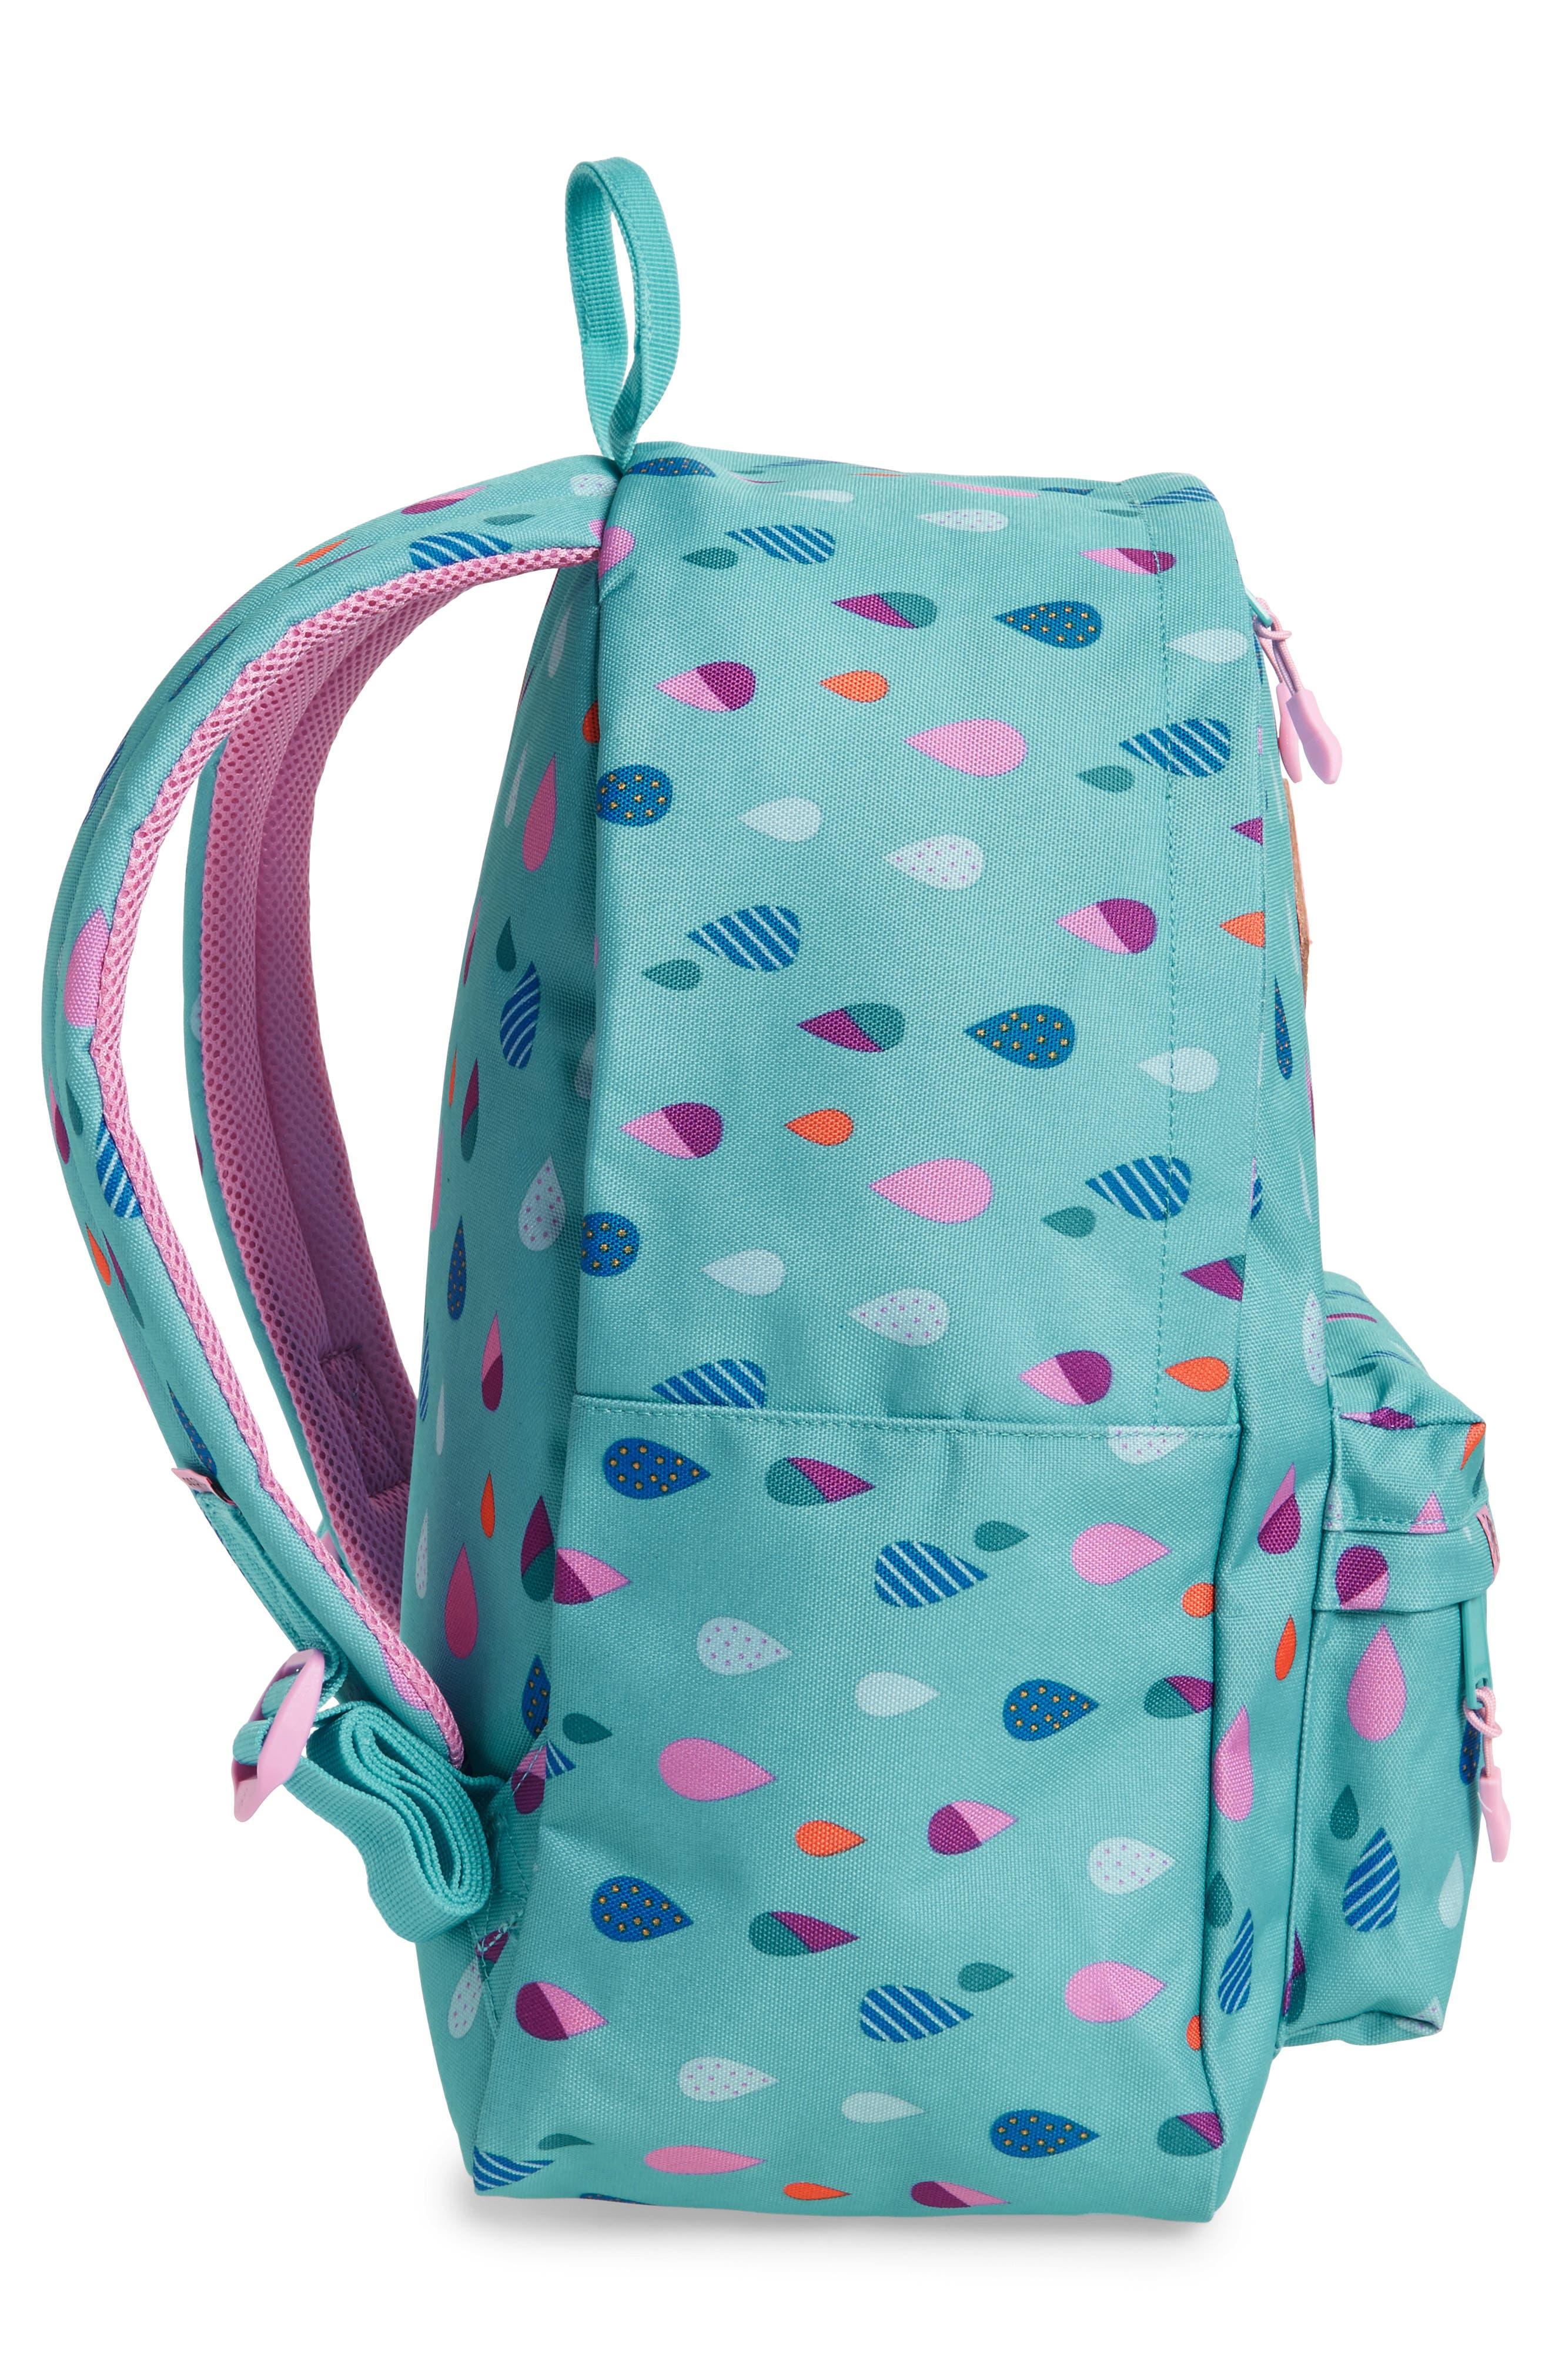 Bayside - Puddles Backpack,                             Alternate thumbnail 3, color,                             Blue